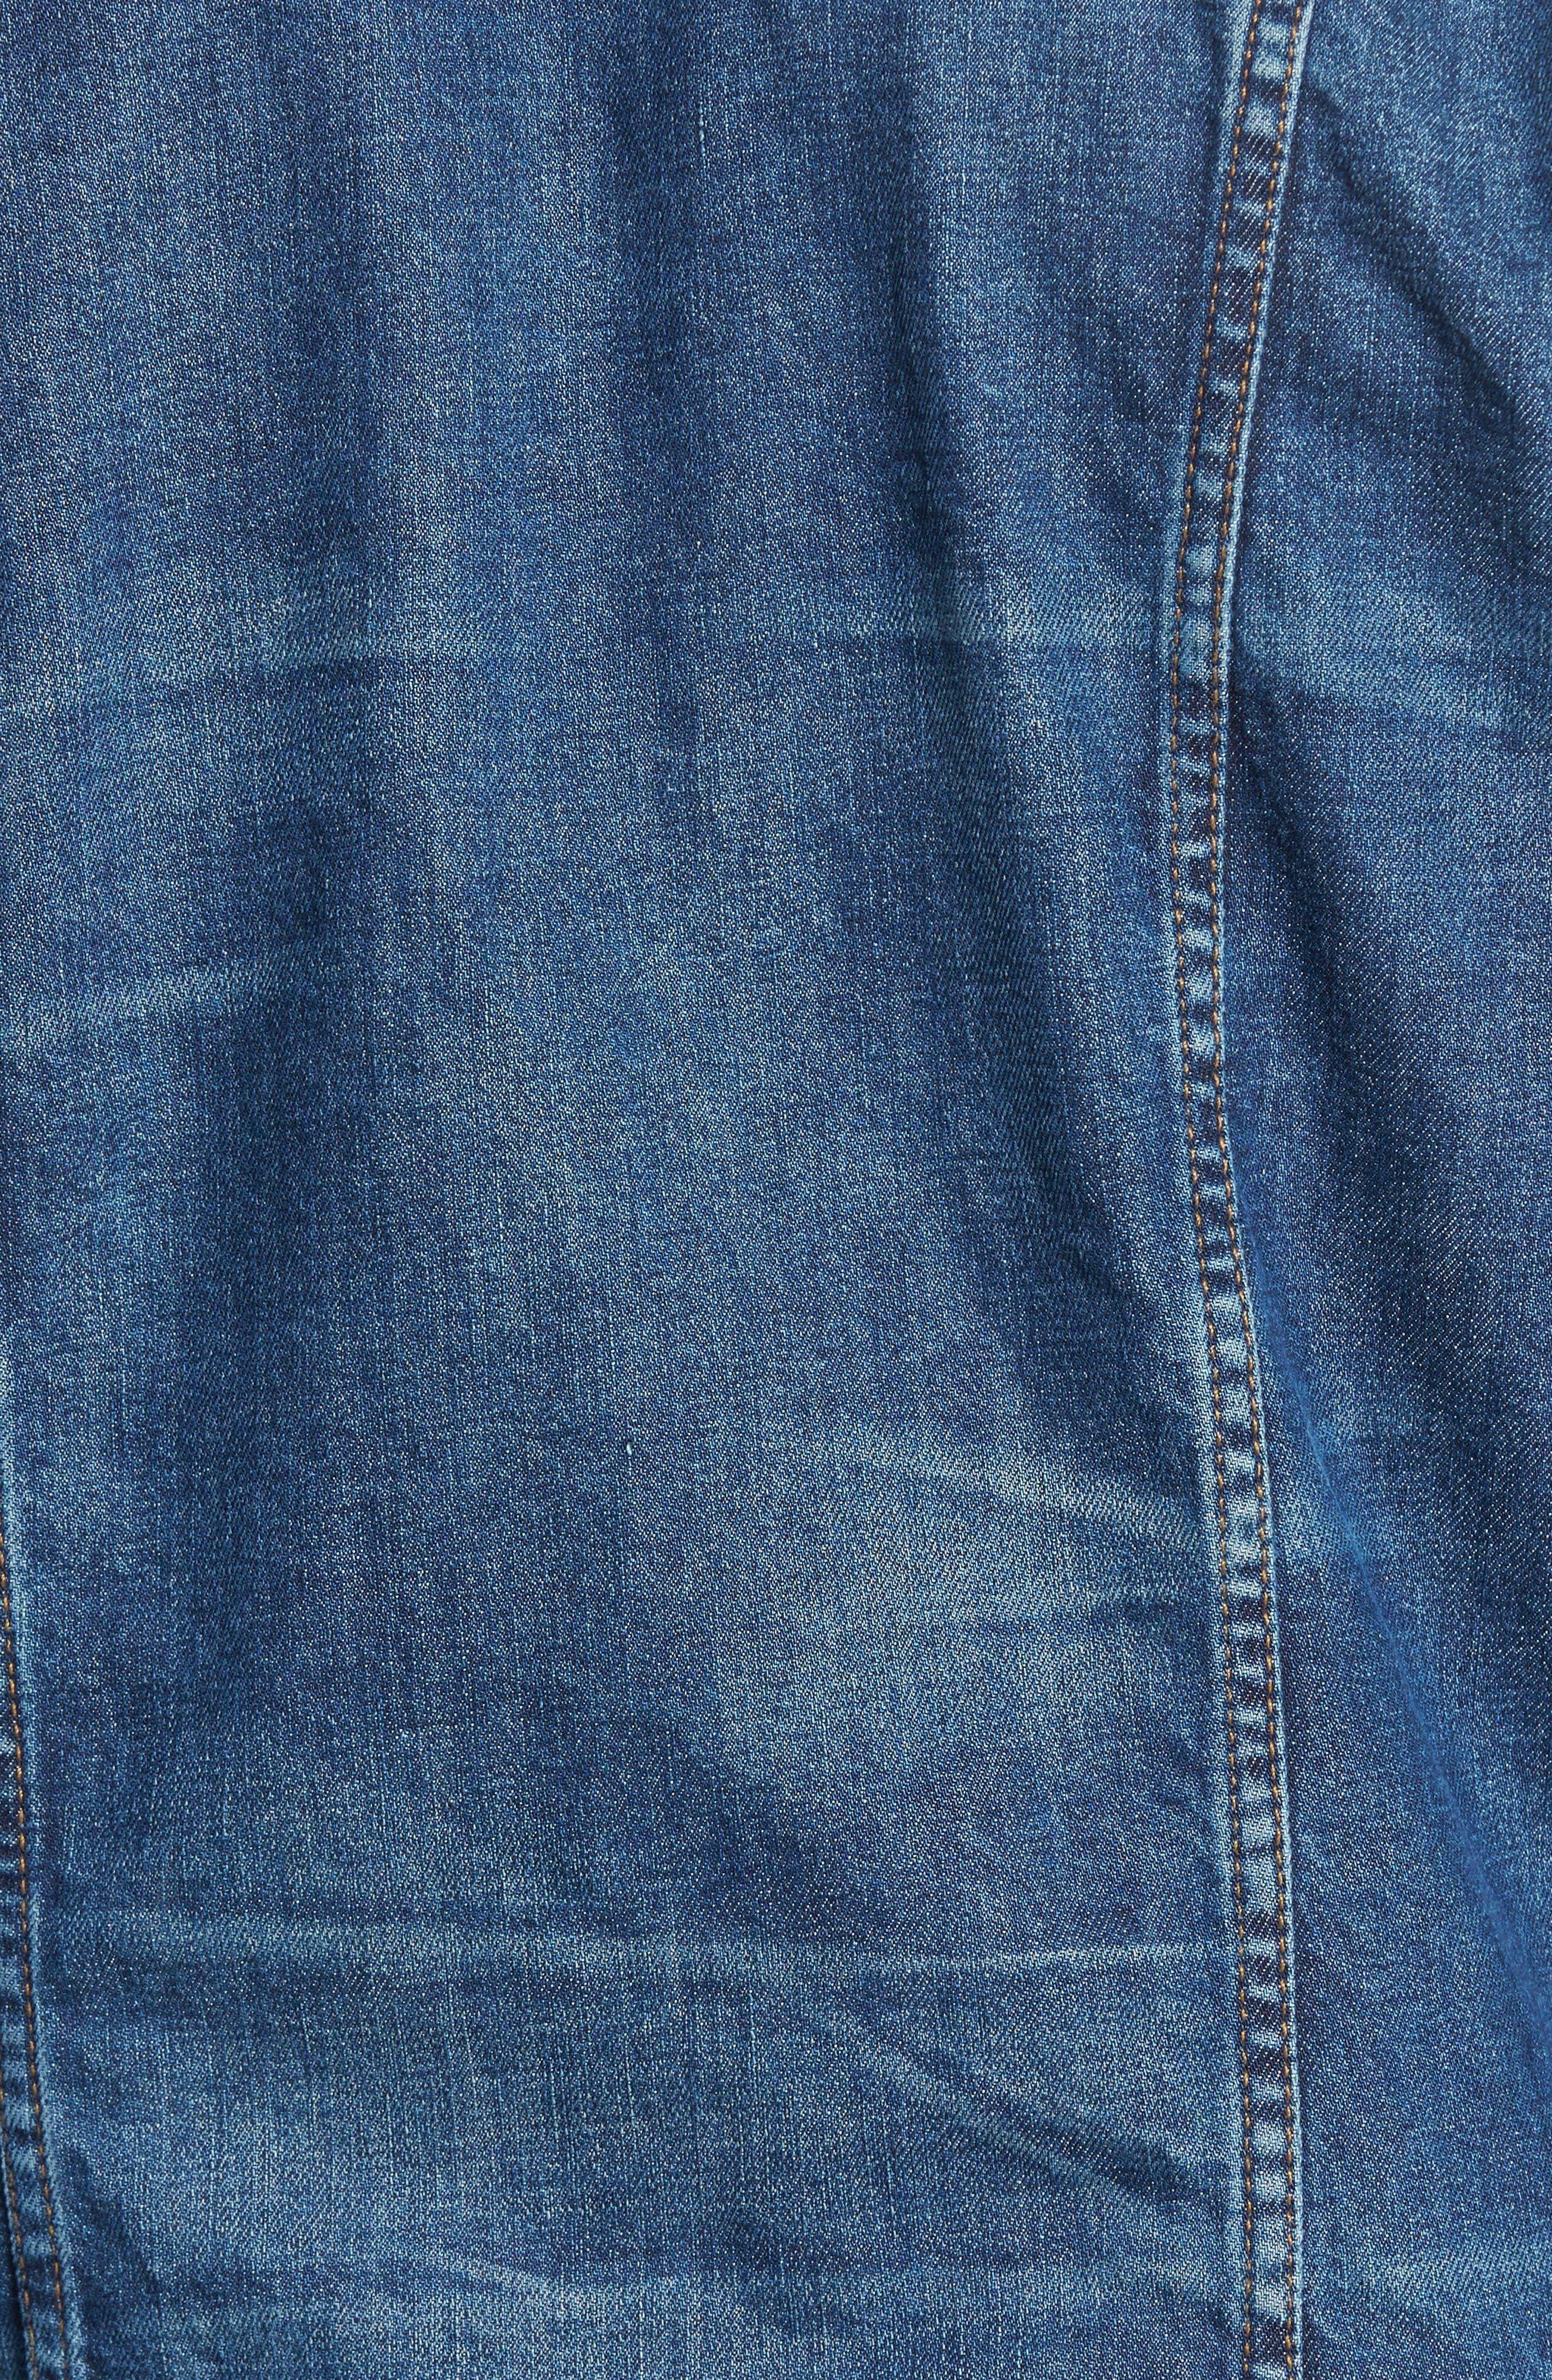 Broc Denim Jacket,                             Alternate thumbnail 5, color,                             Aspirant